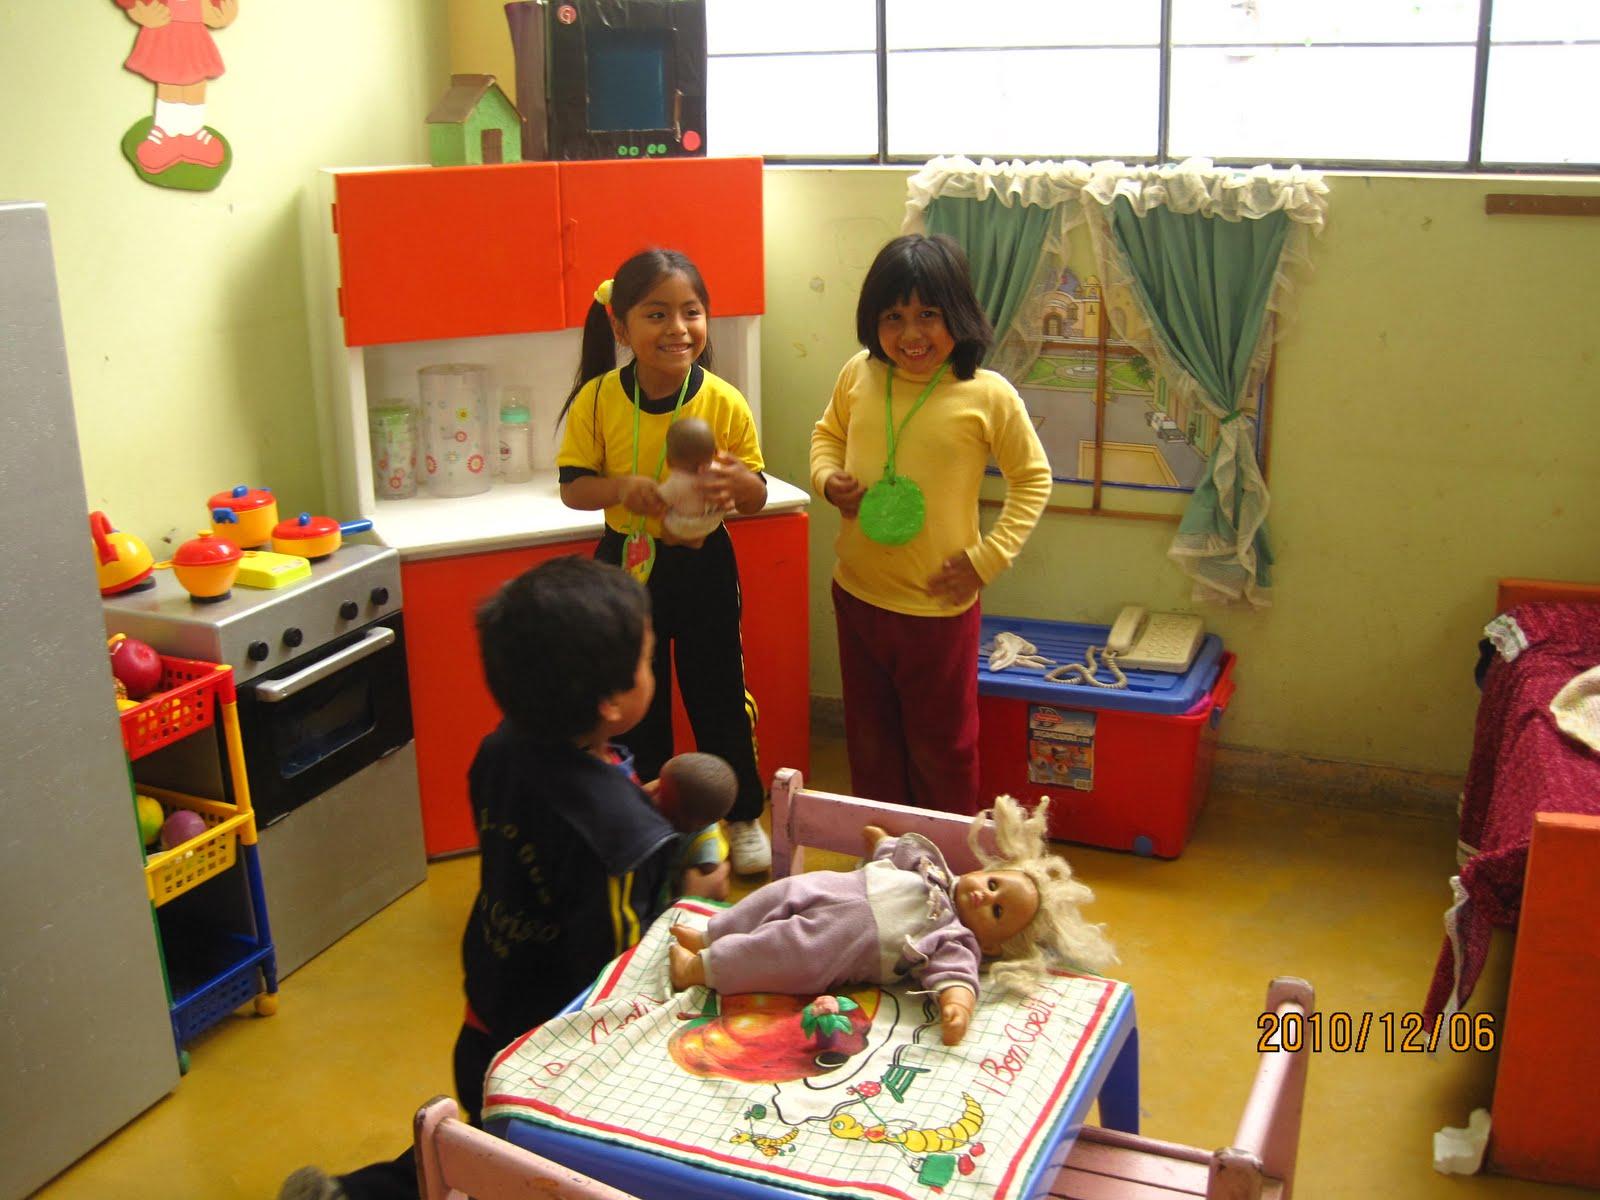 Trabajodecampopelainicial sector de dramatizaci n hogar for Casa articulos del hogar